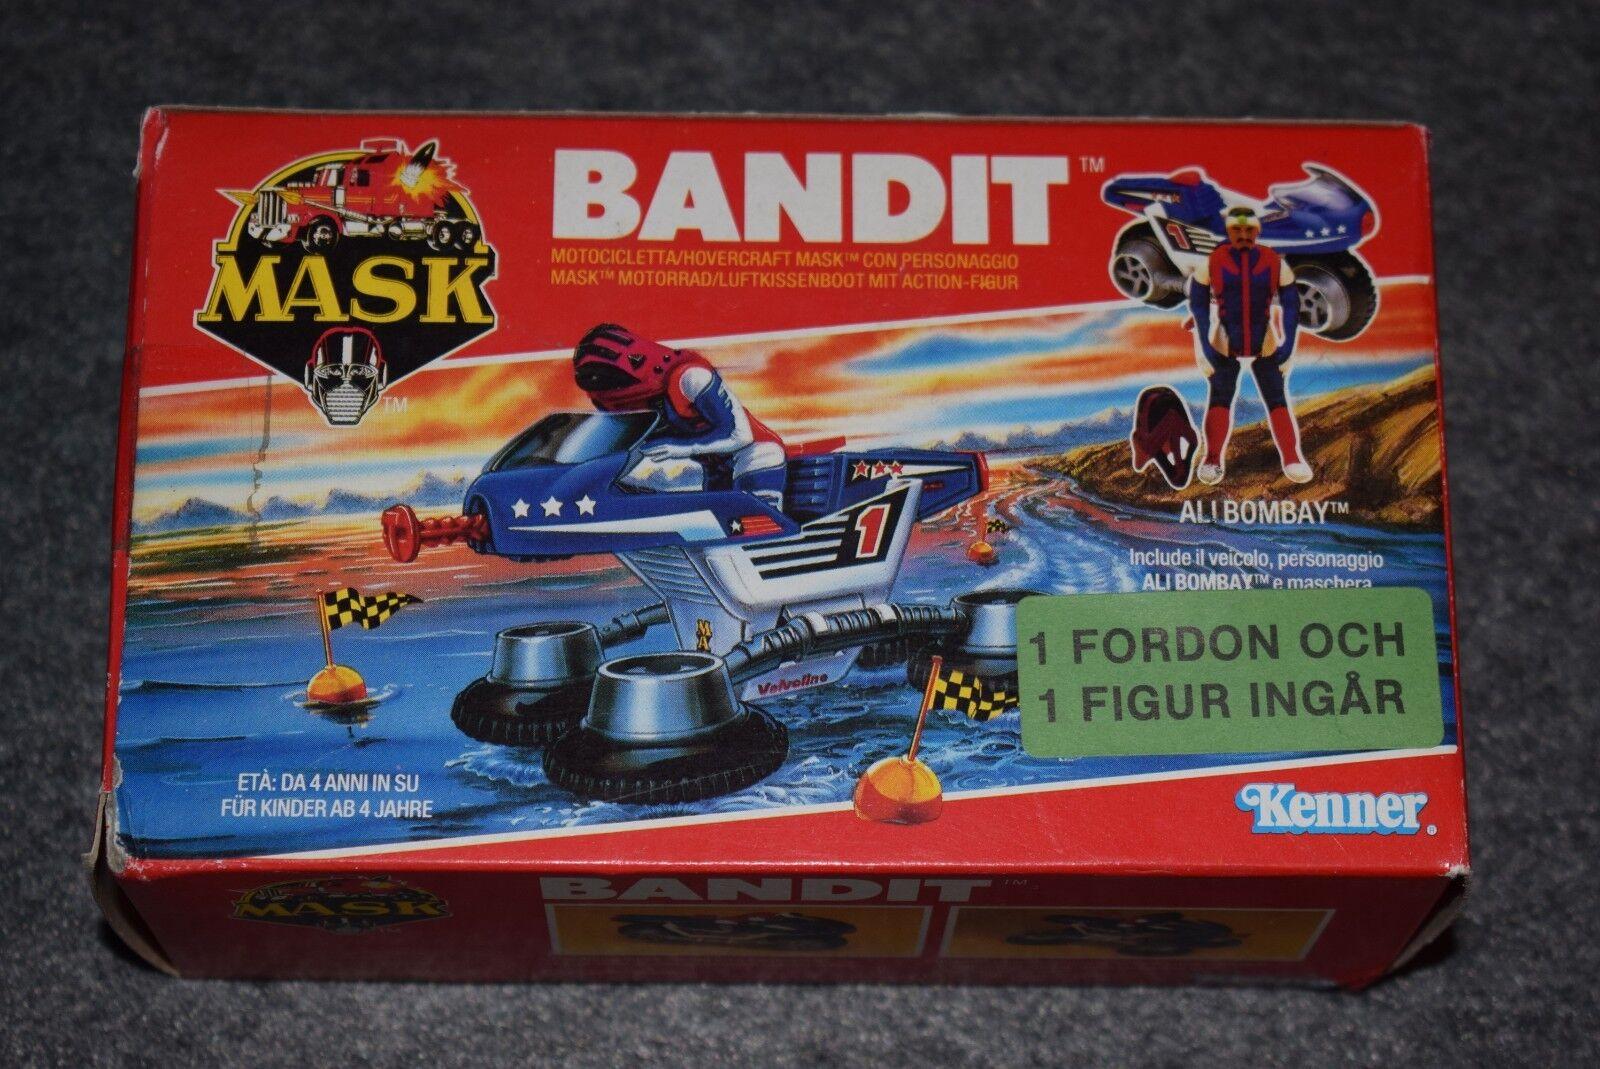 MASK Bandit MISB from Kenner